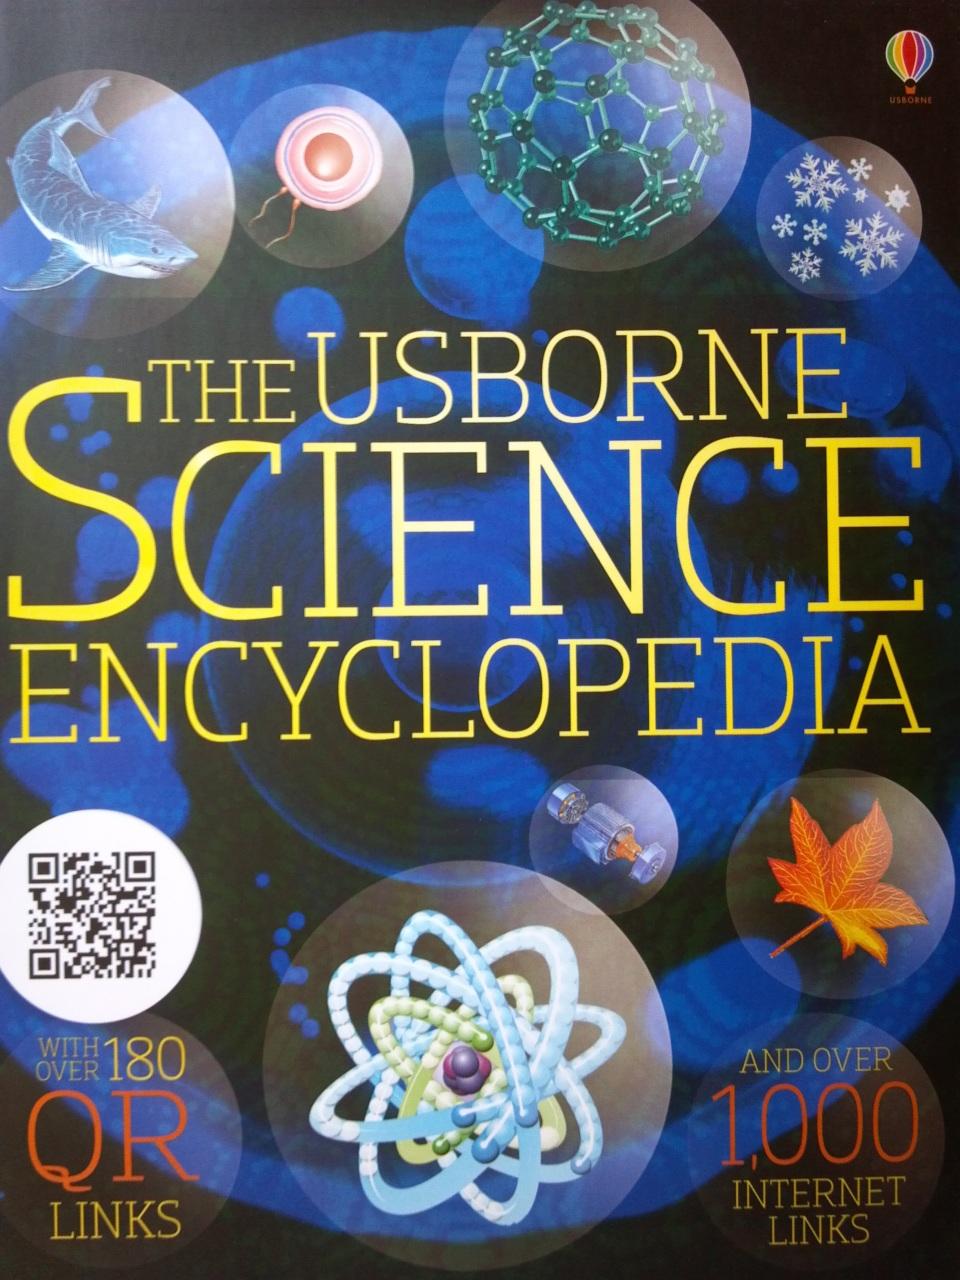 7th grade west brooke curriculum west brooke curriculum publicscrutiny Images